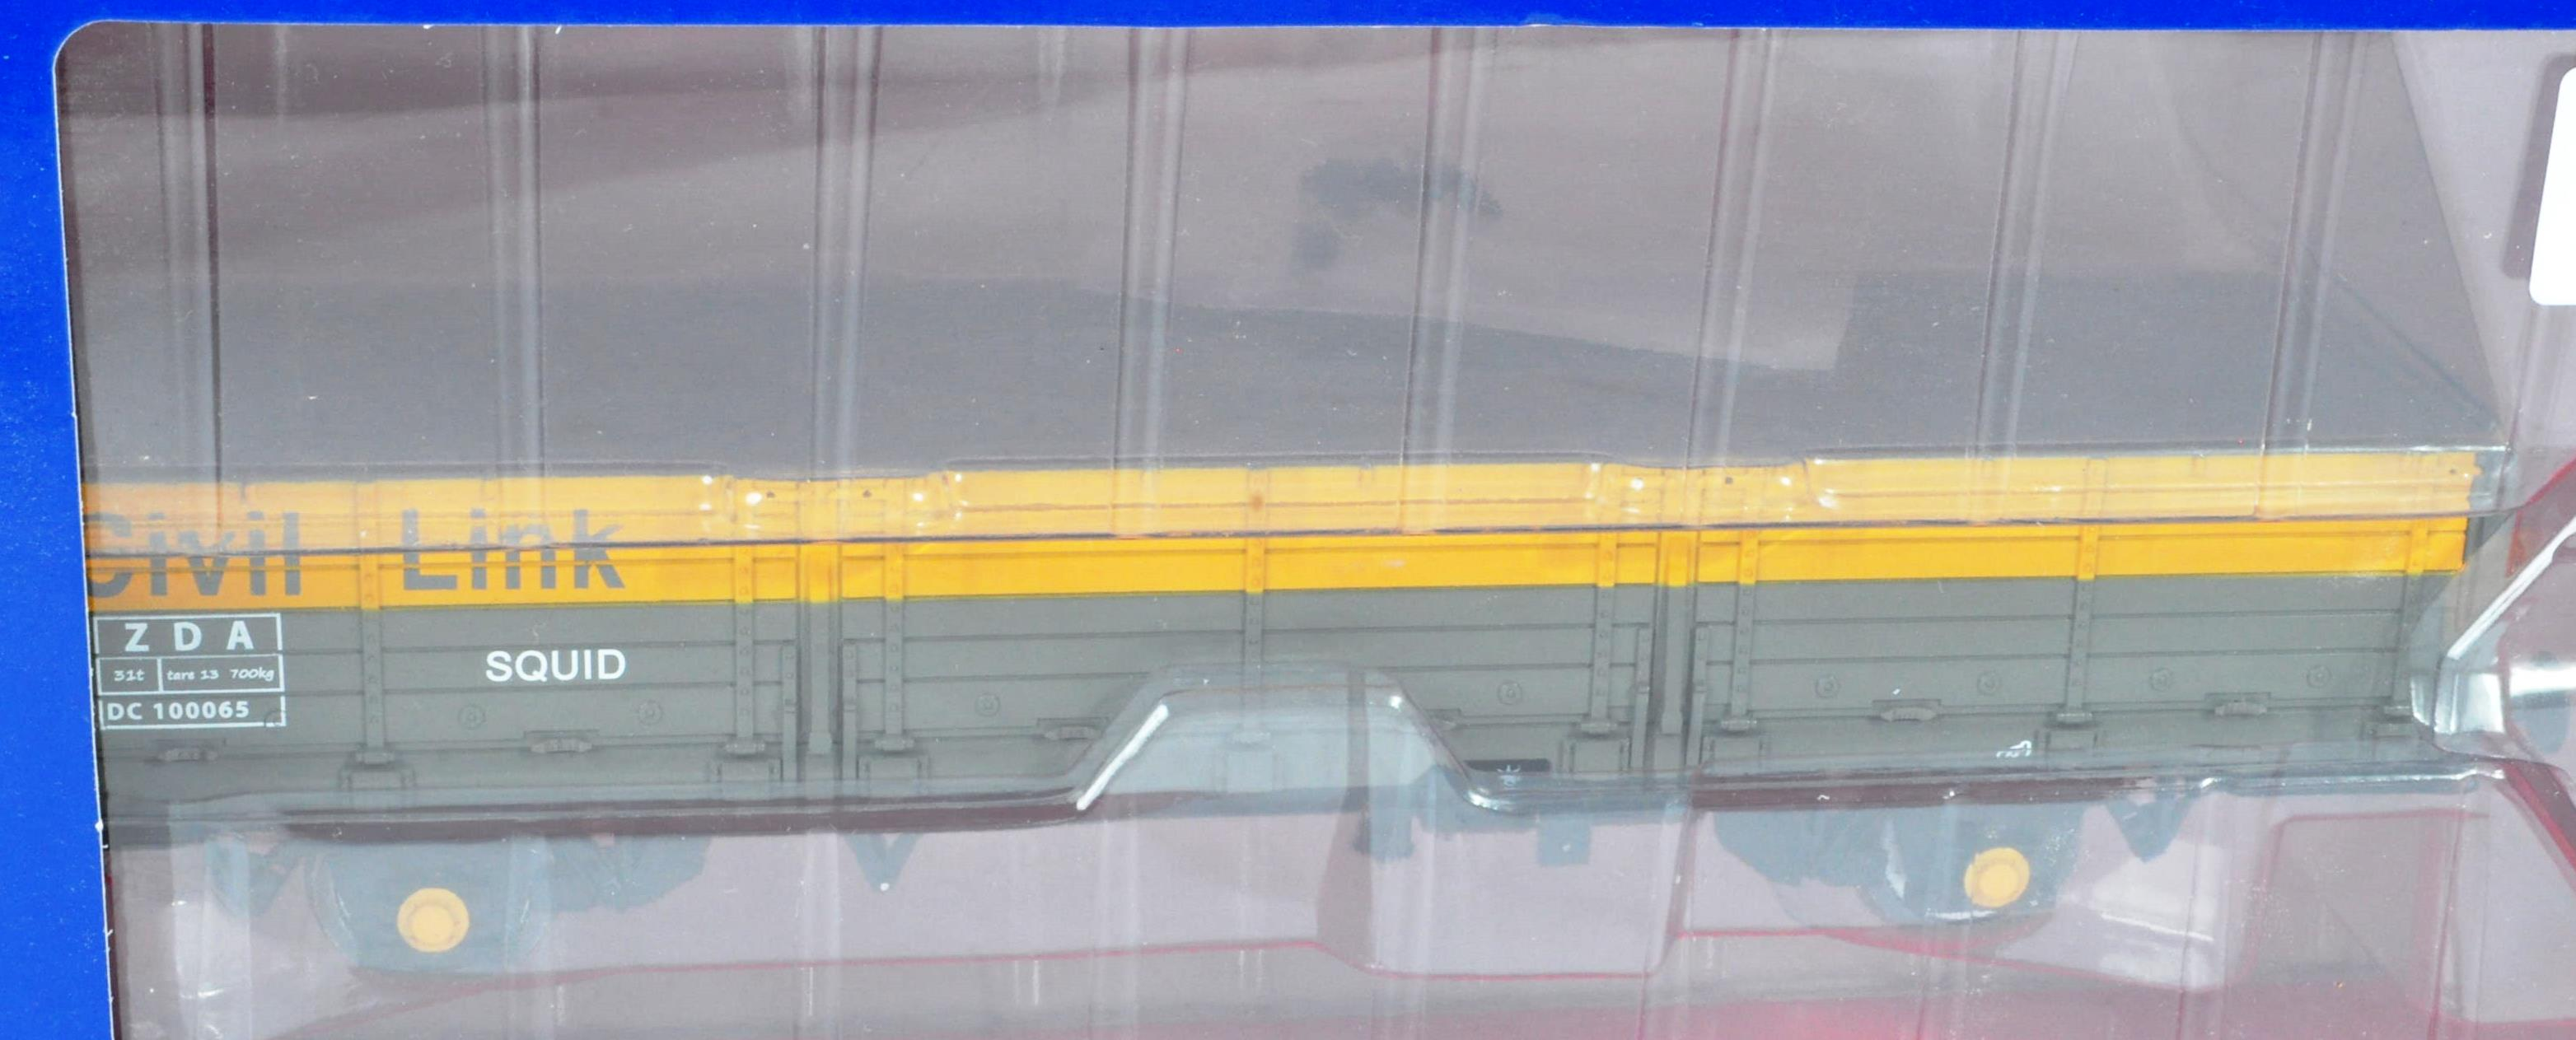 ORIGINAL HELJAN MADE O GAUGE MODEL RAILWAY ROLLING STOCK WAGON - Image 2 of 4